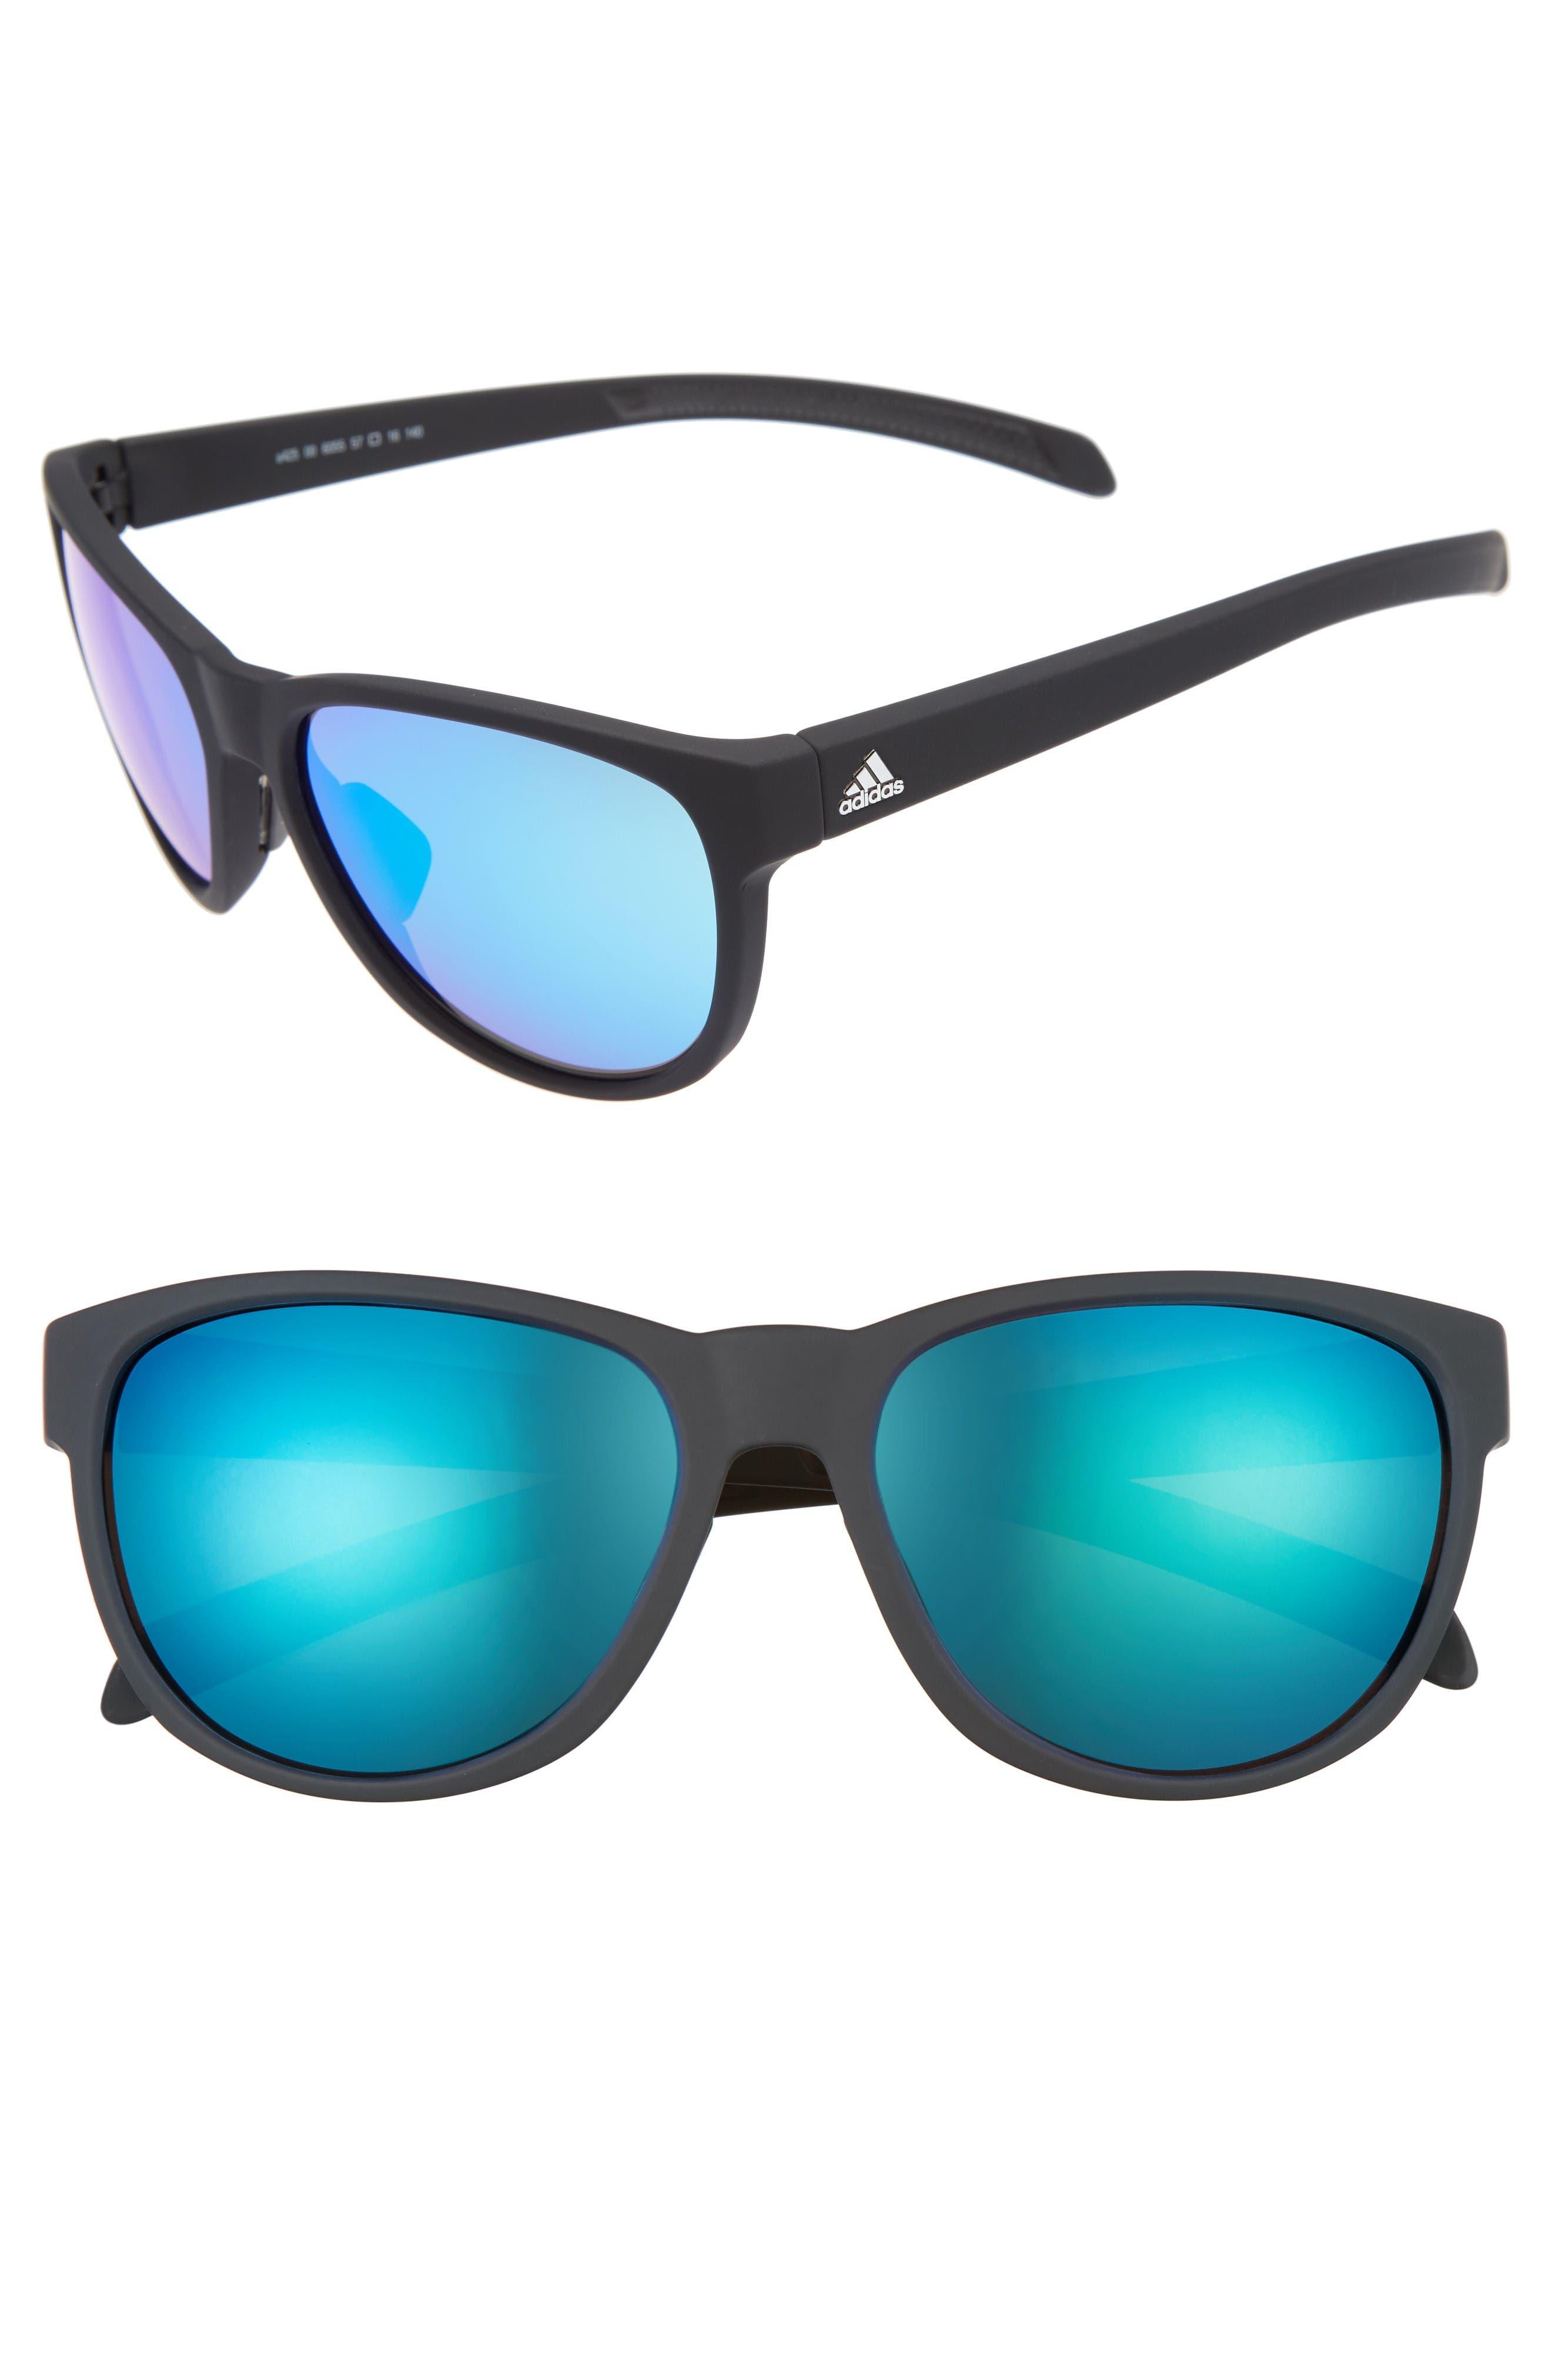 ADIDAS Wildcharge 57mm Mirrored Sunglasses